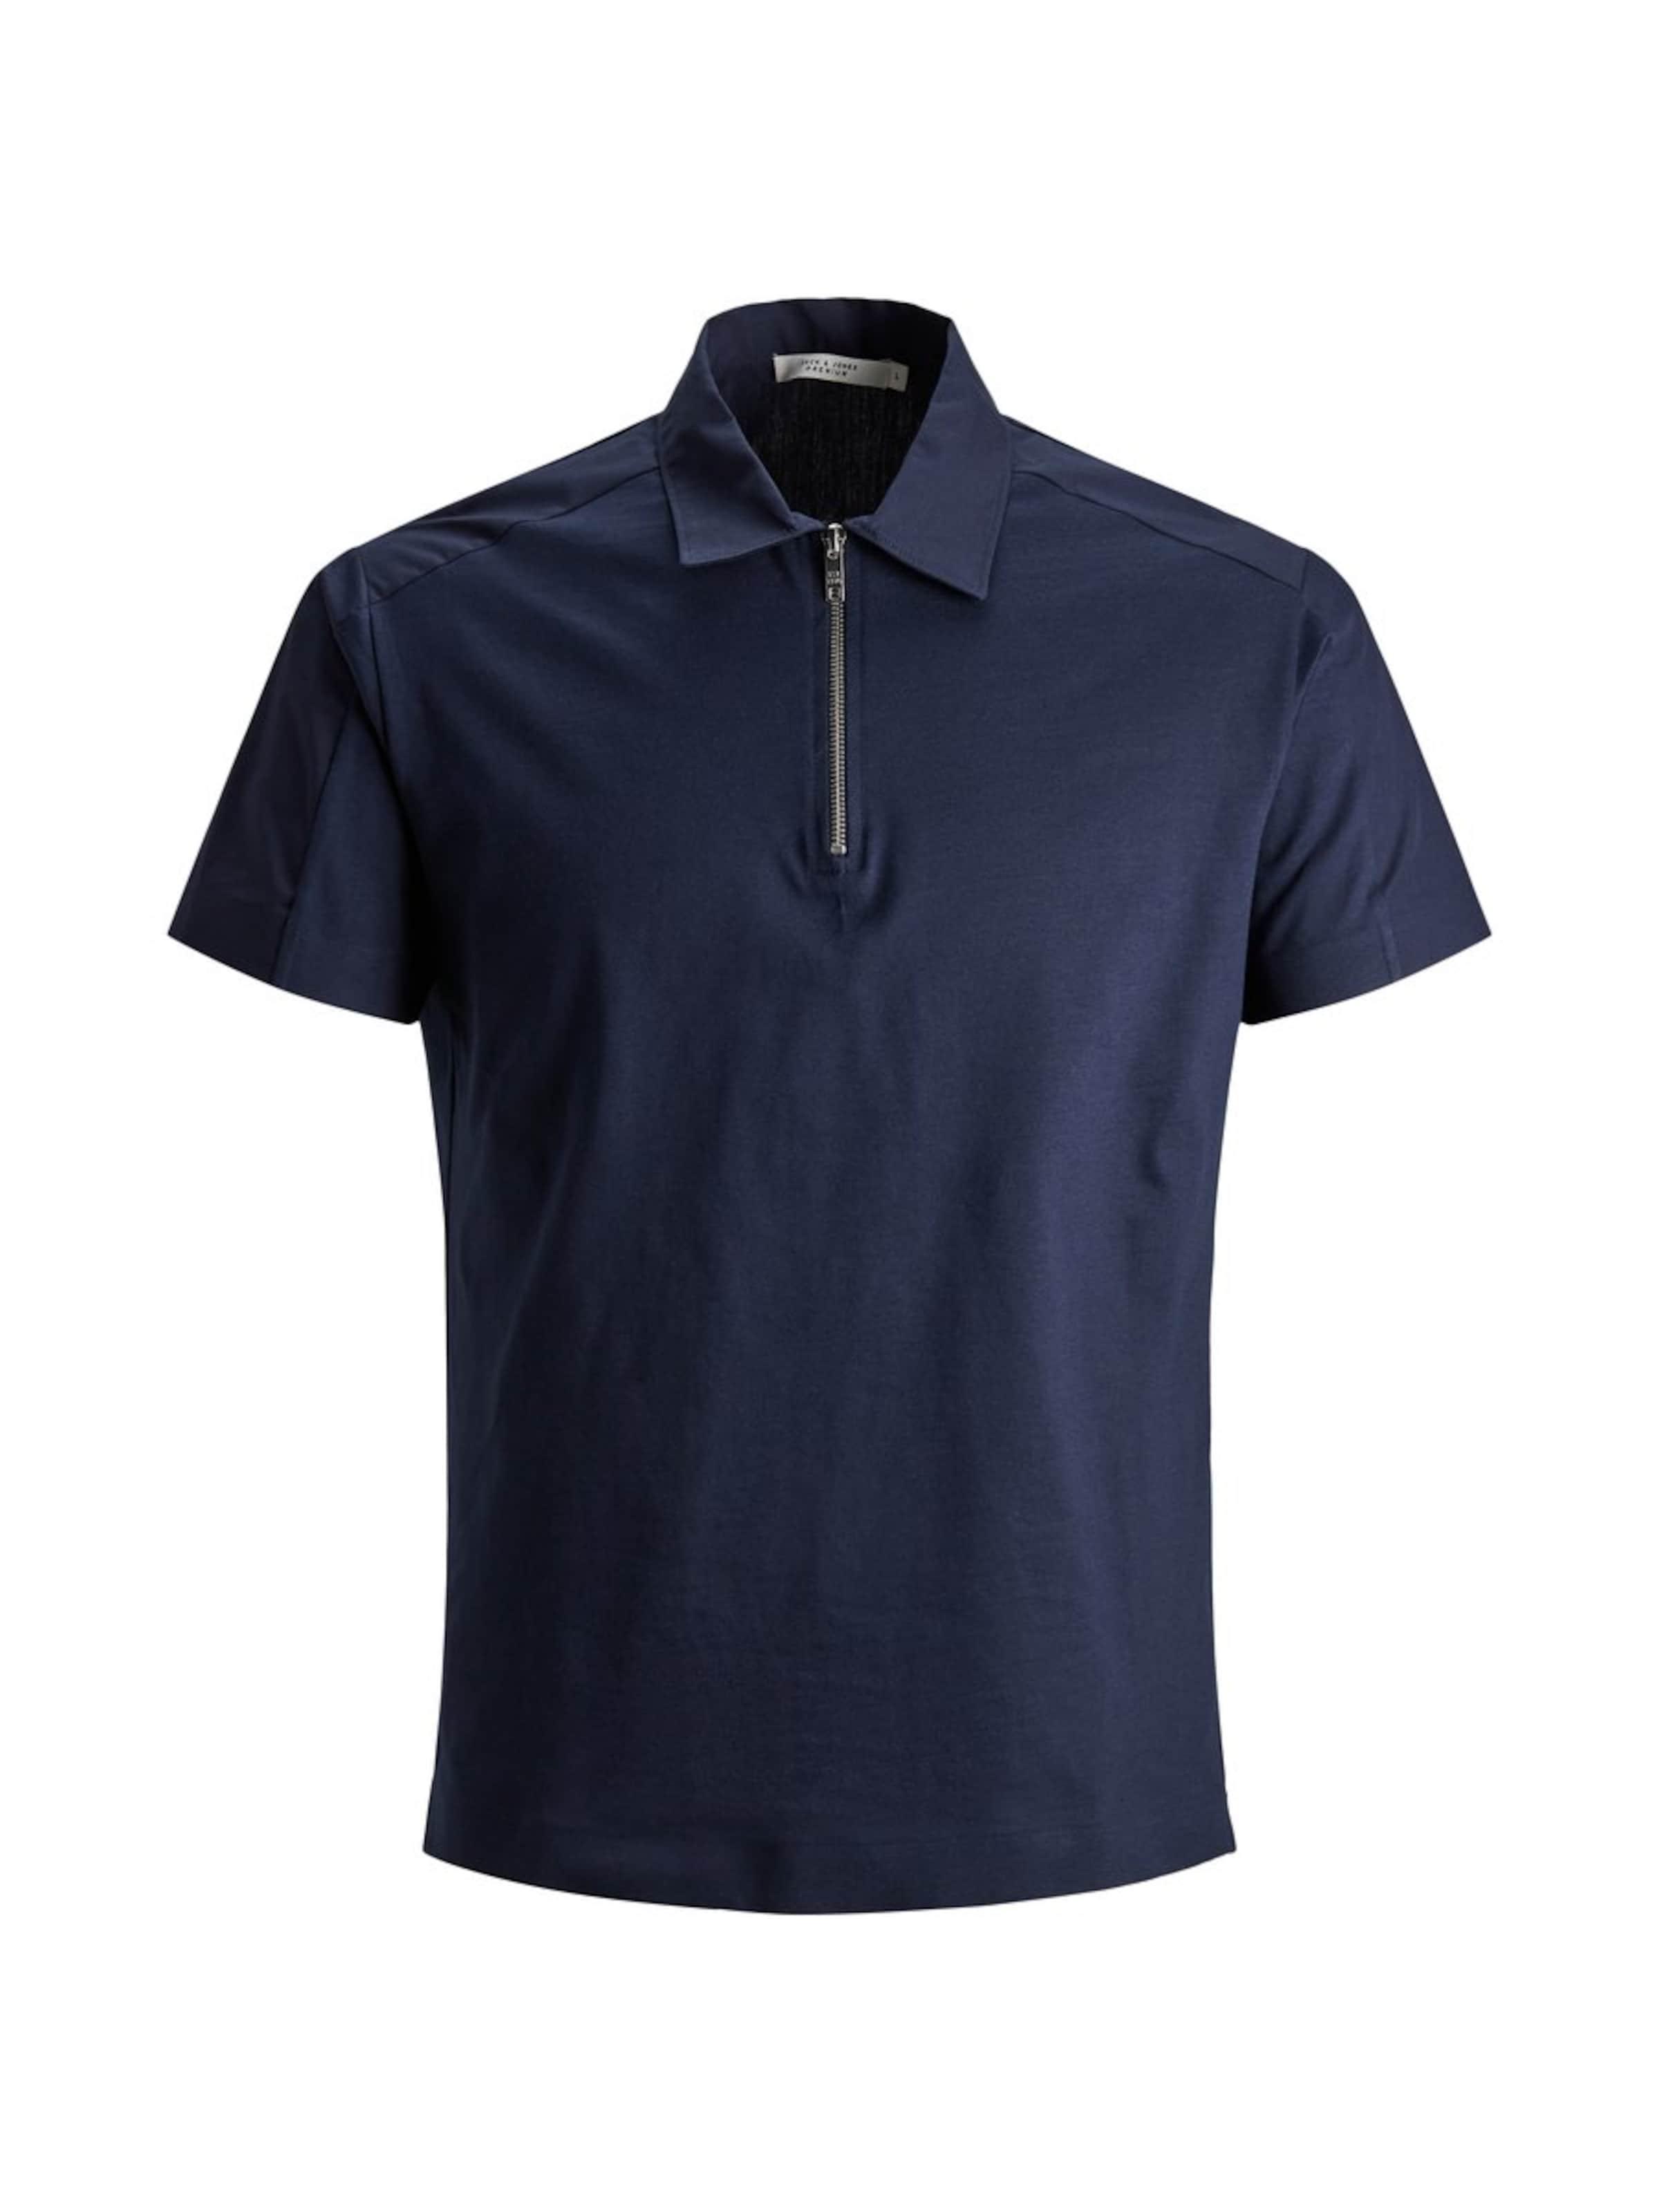 En Bleu Jackamp; shirt Marine Jones T n8vwmN0O